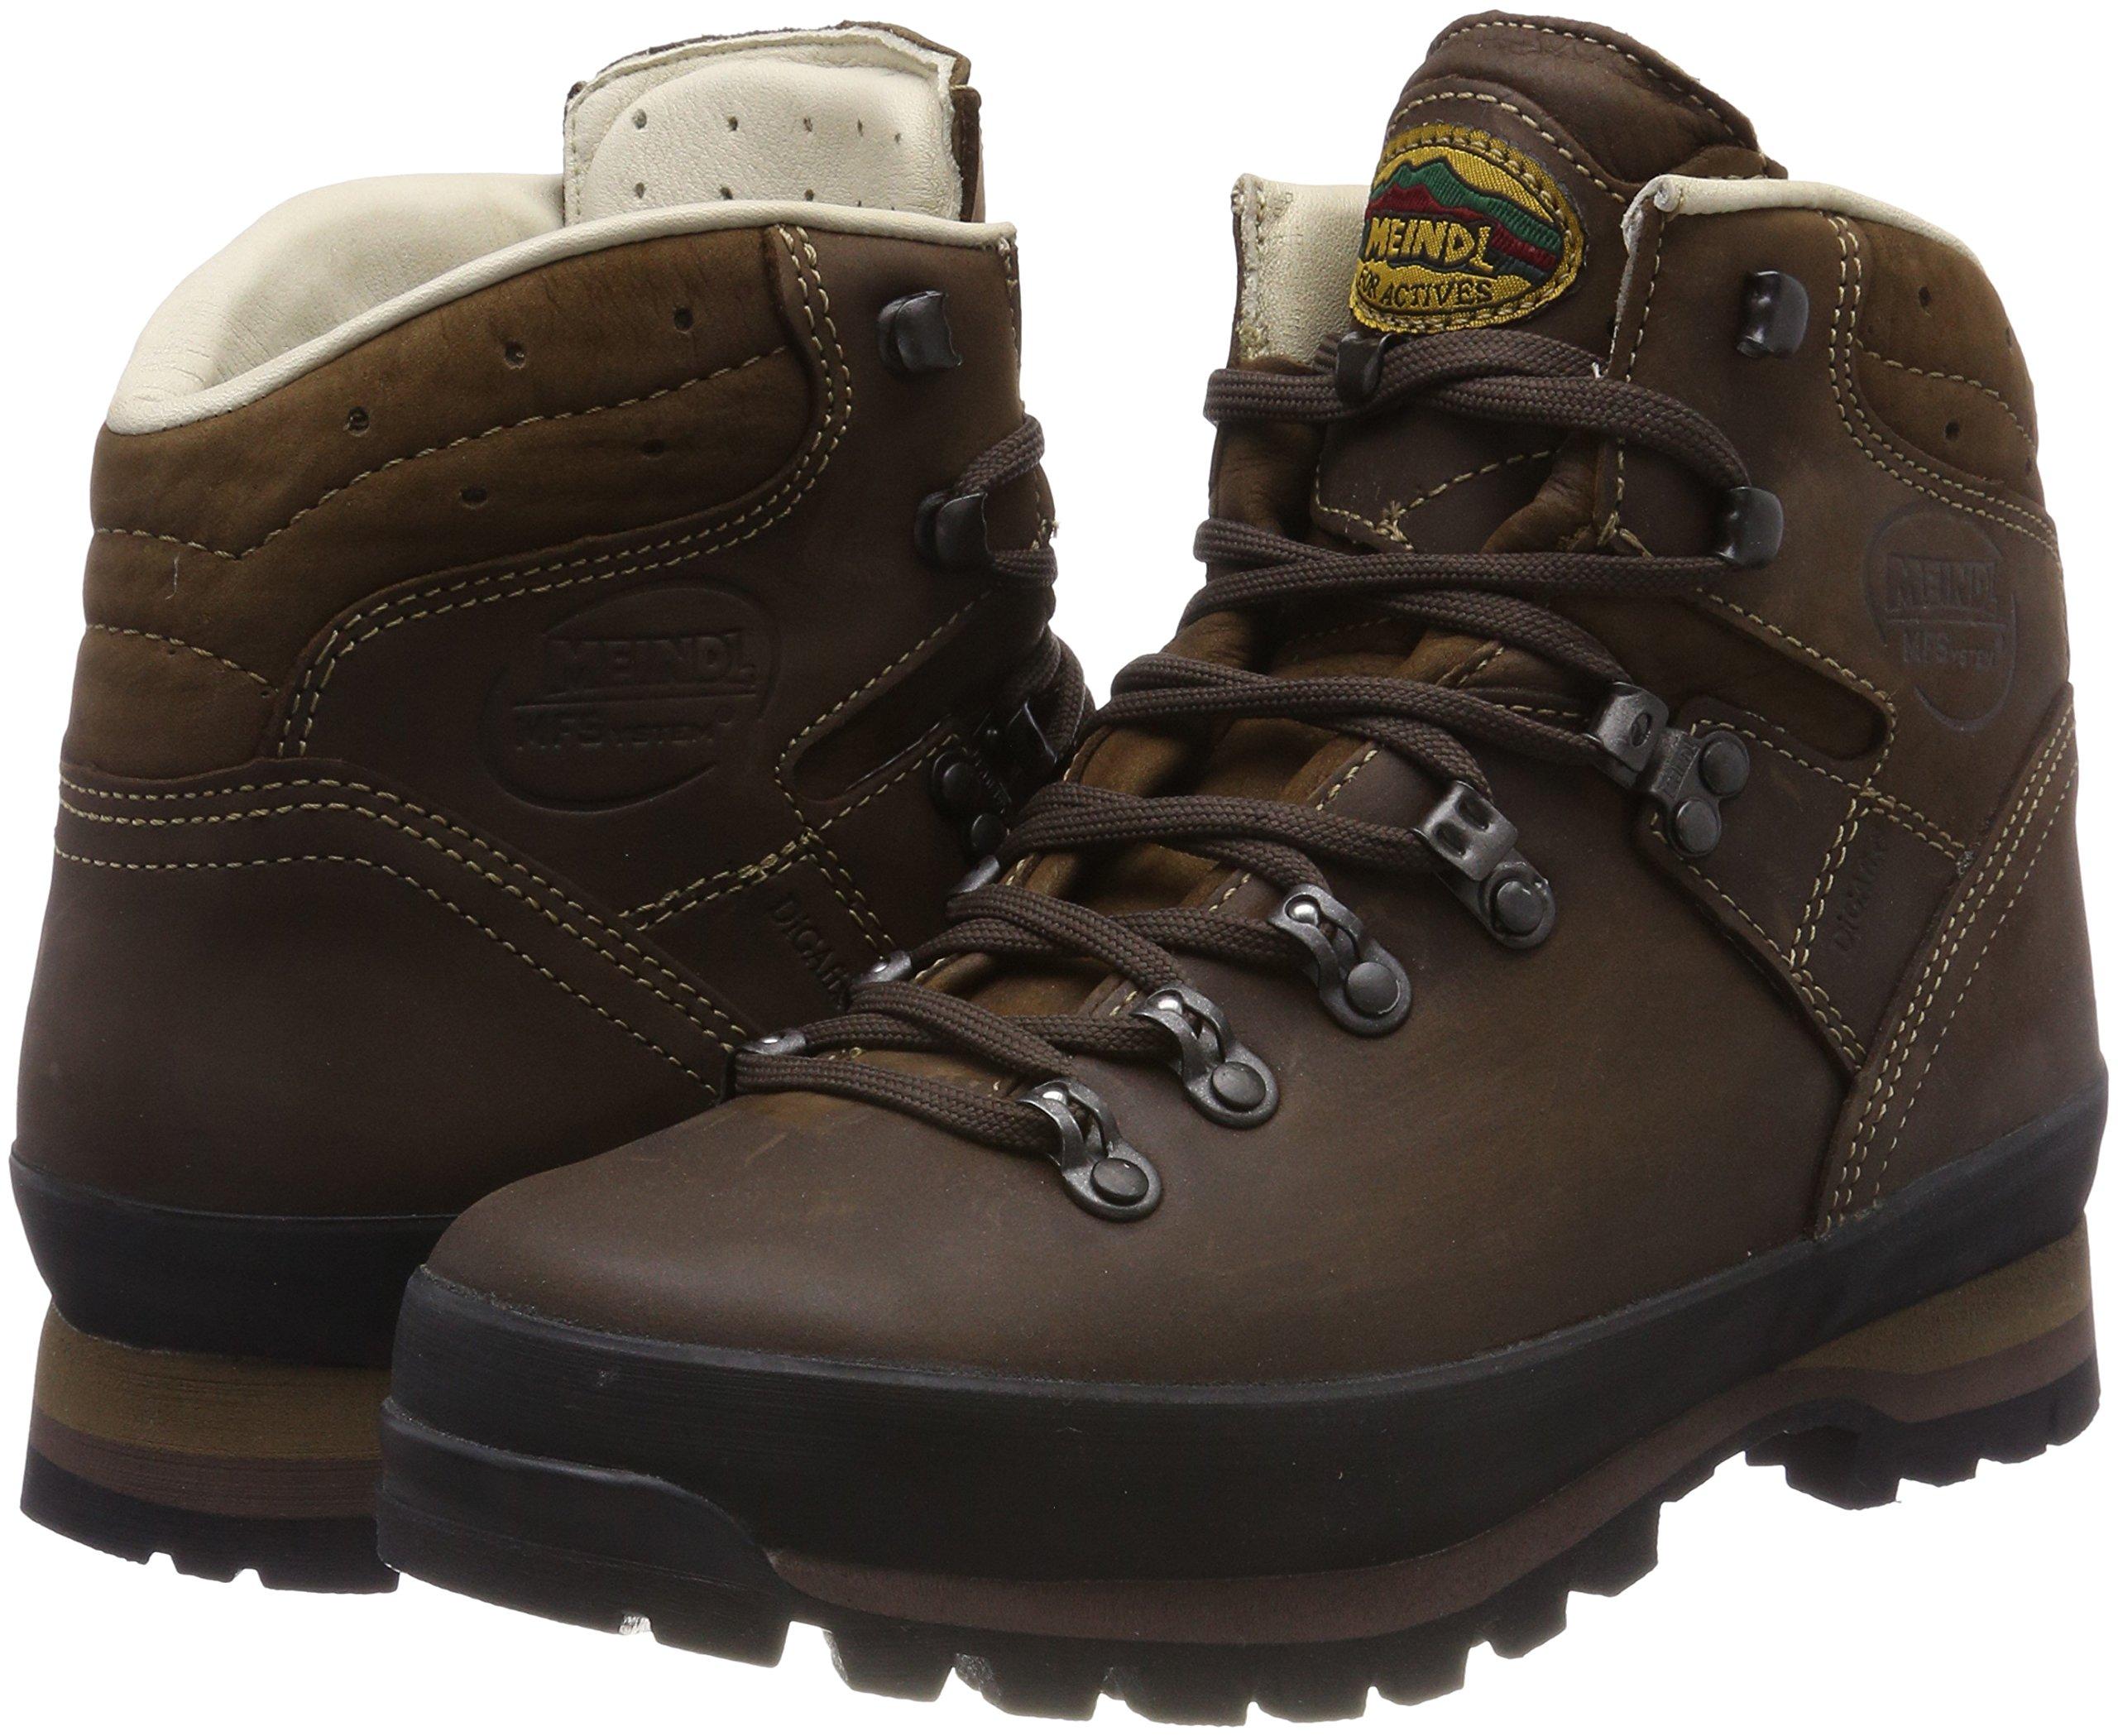 91WXe1V XBL - Meindl Women's Borneo Lady 2 MFS (XL) High Rise Hiking Shoes